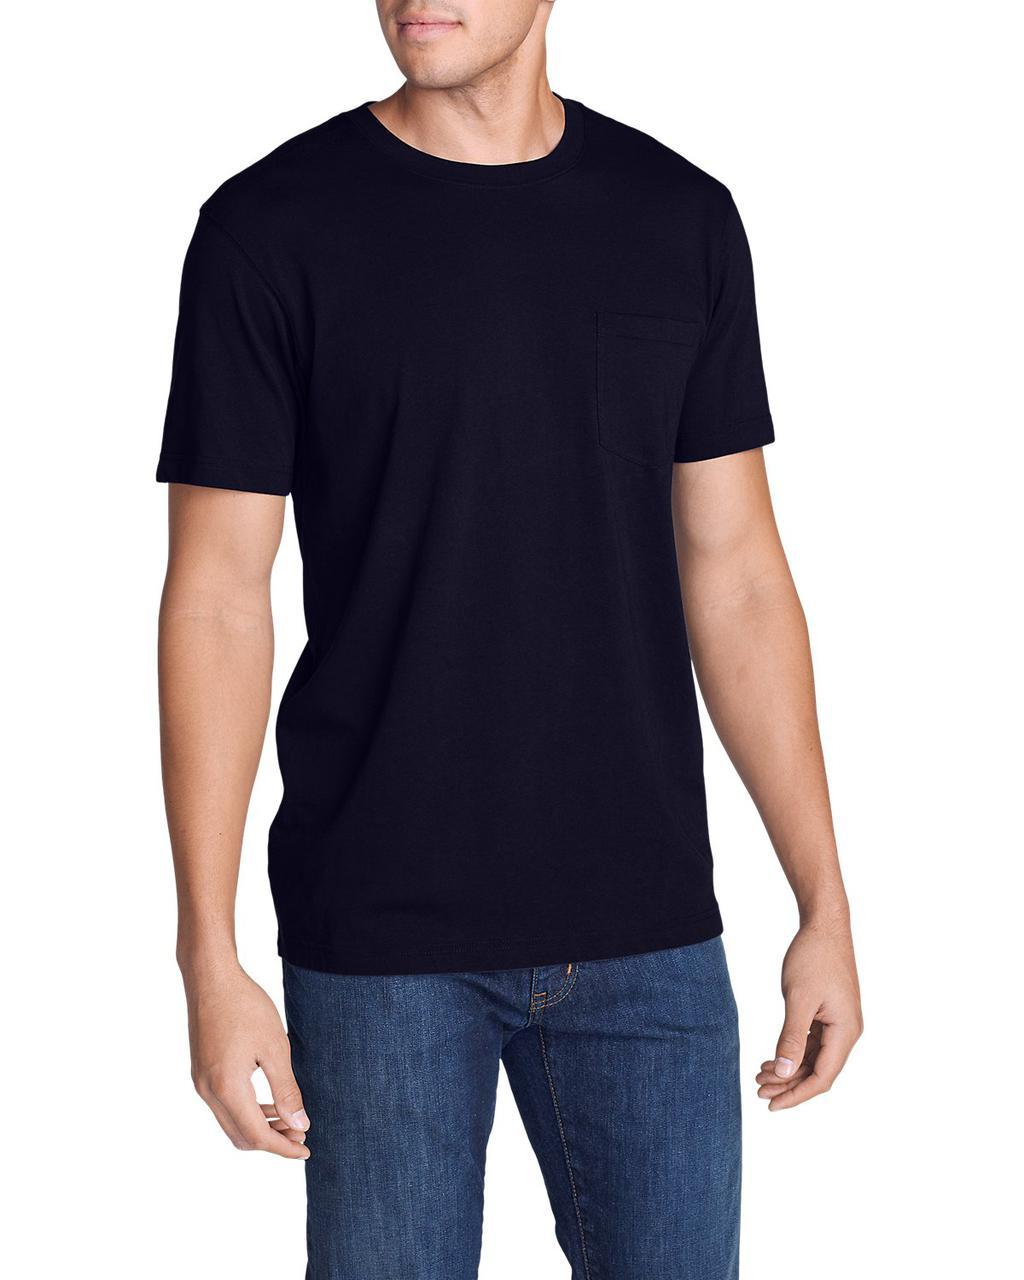 Футболка Eddie Bauer Legend Wash Short-Sleeve Pocket T-Shirt - Classic Fit L